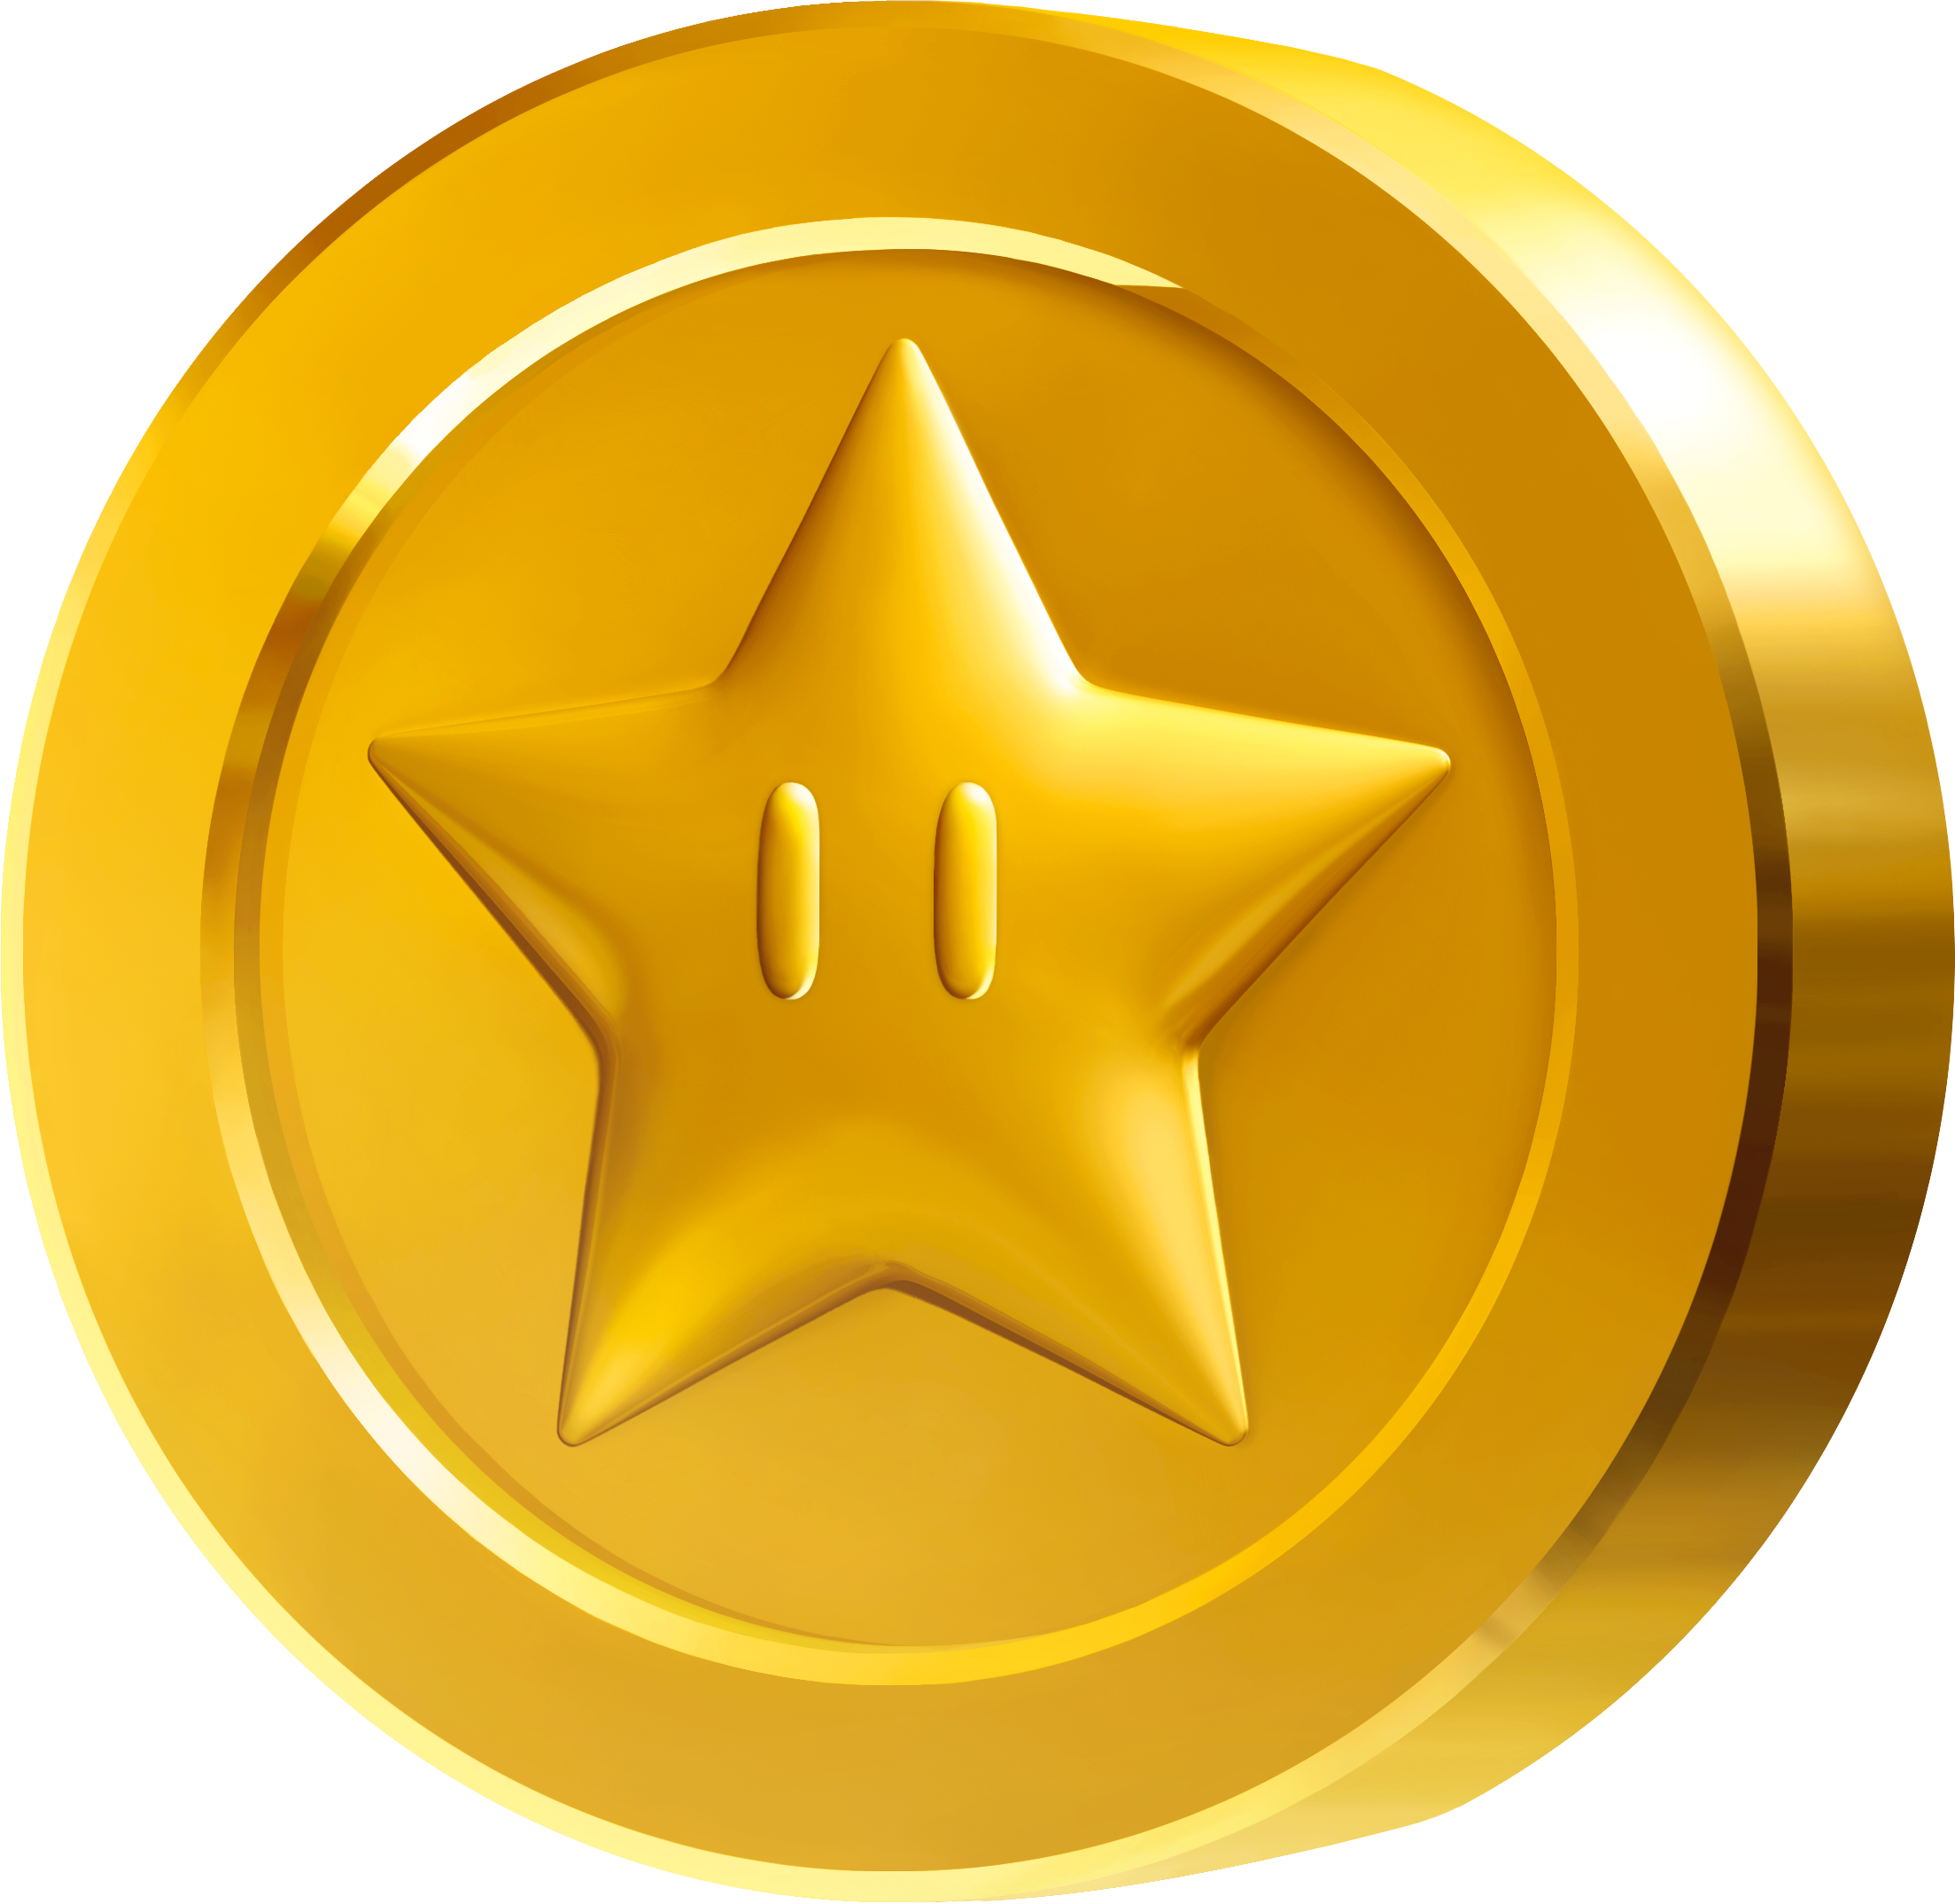 Mario star clipart no background banner freeuse stock imagenes de mario bros monedas - Buscar con Google | imagenes varias ... banner freeuse stock